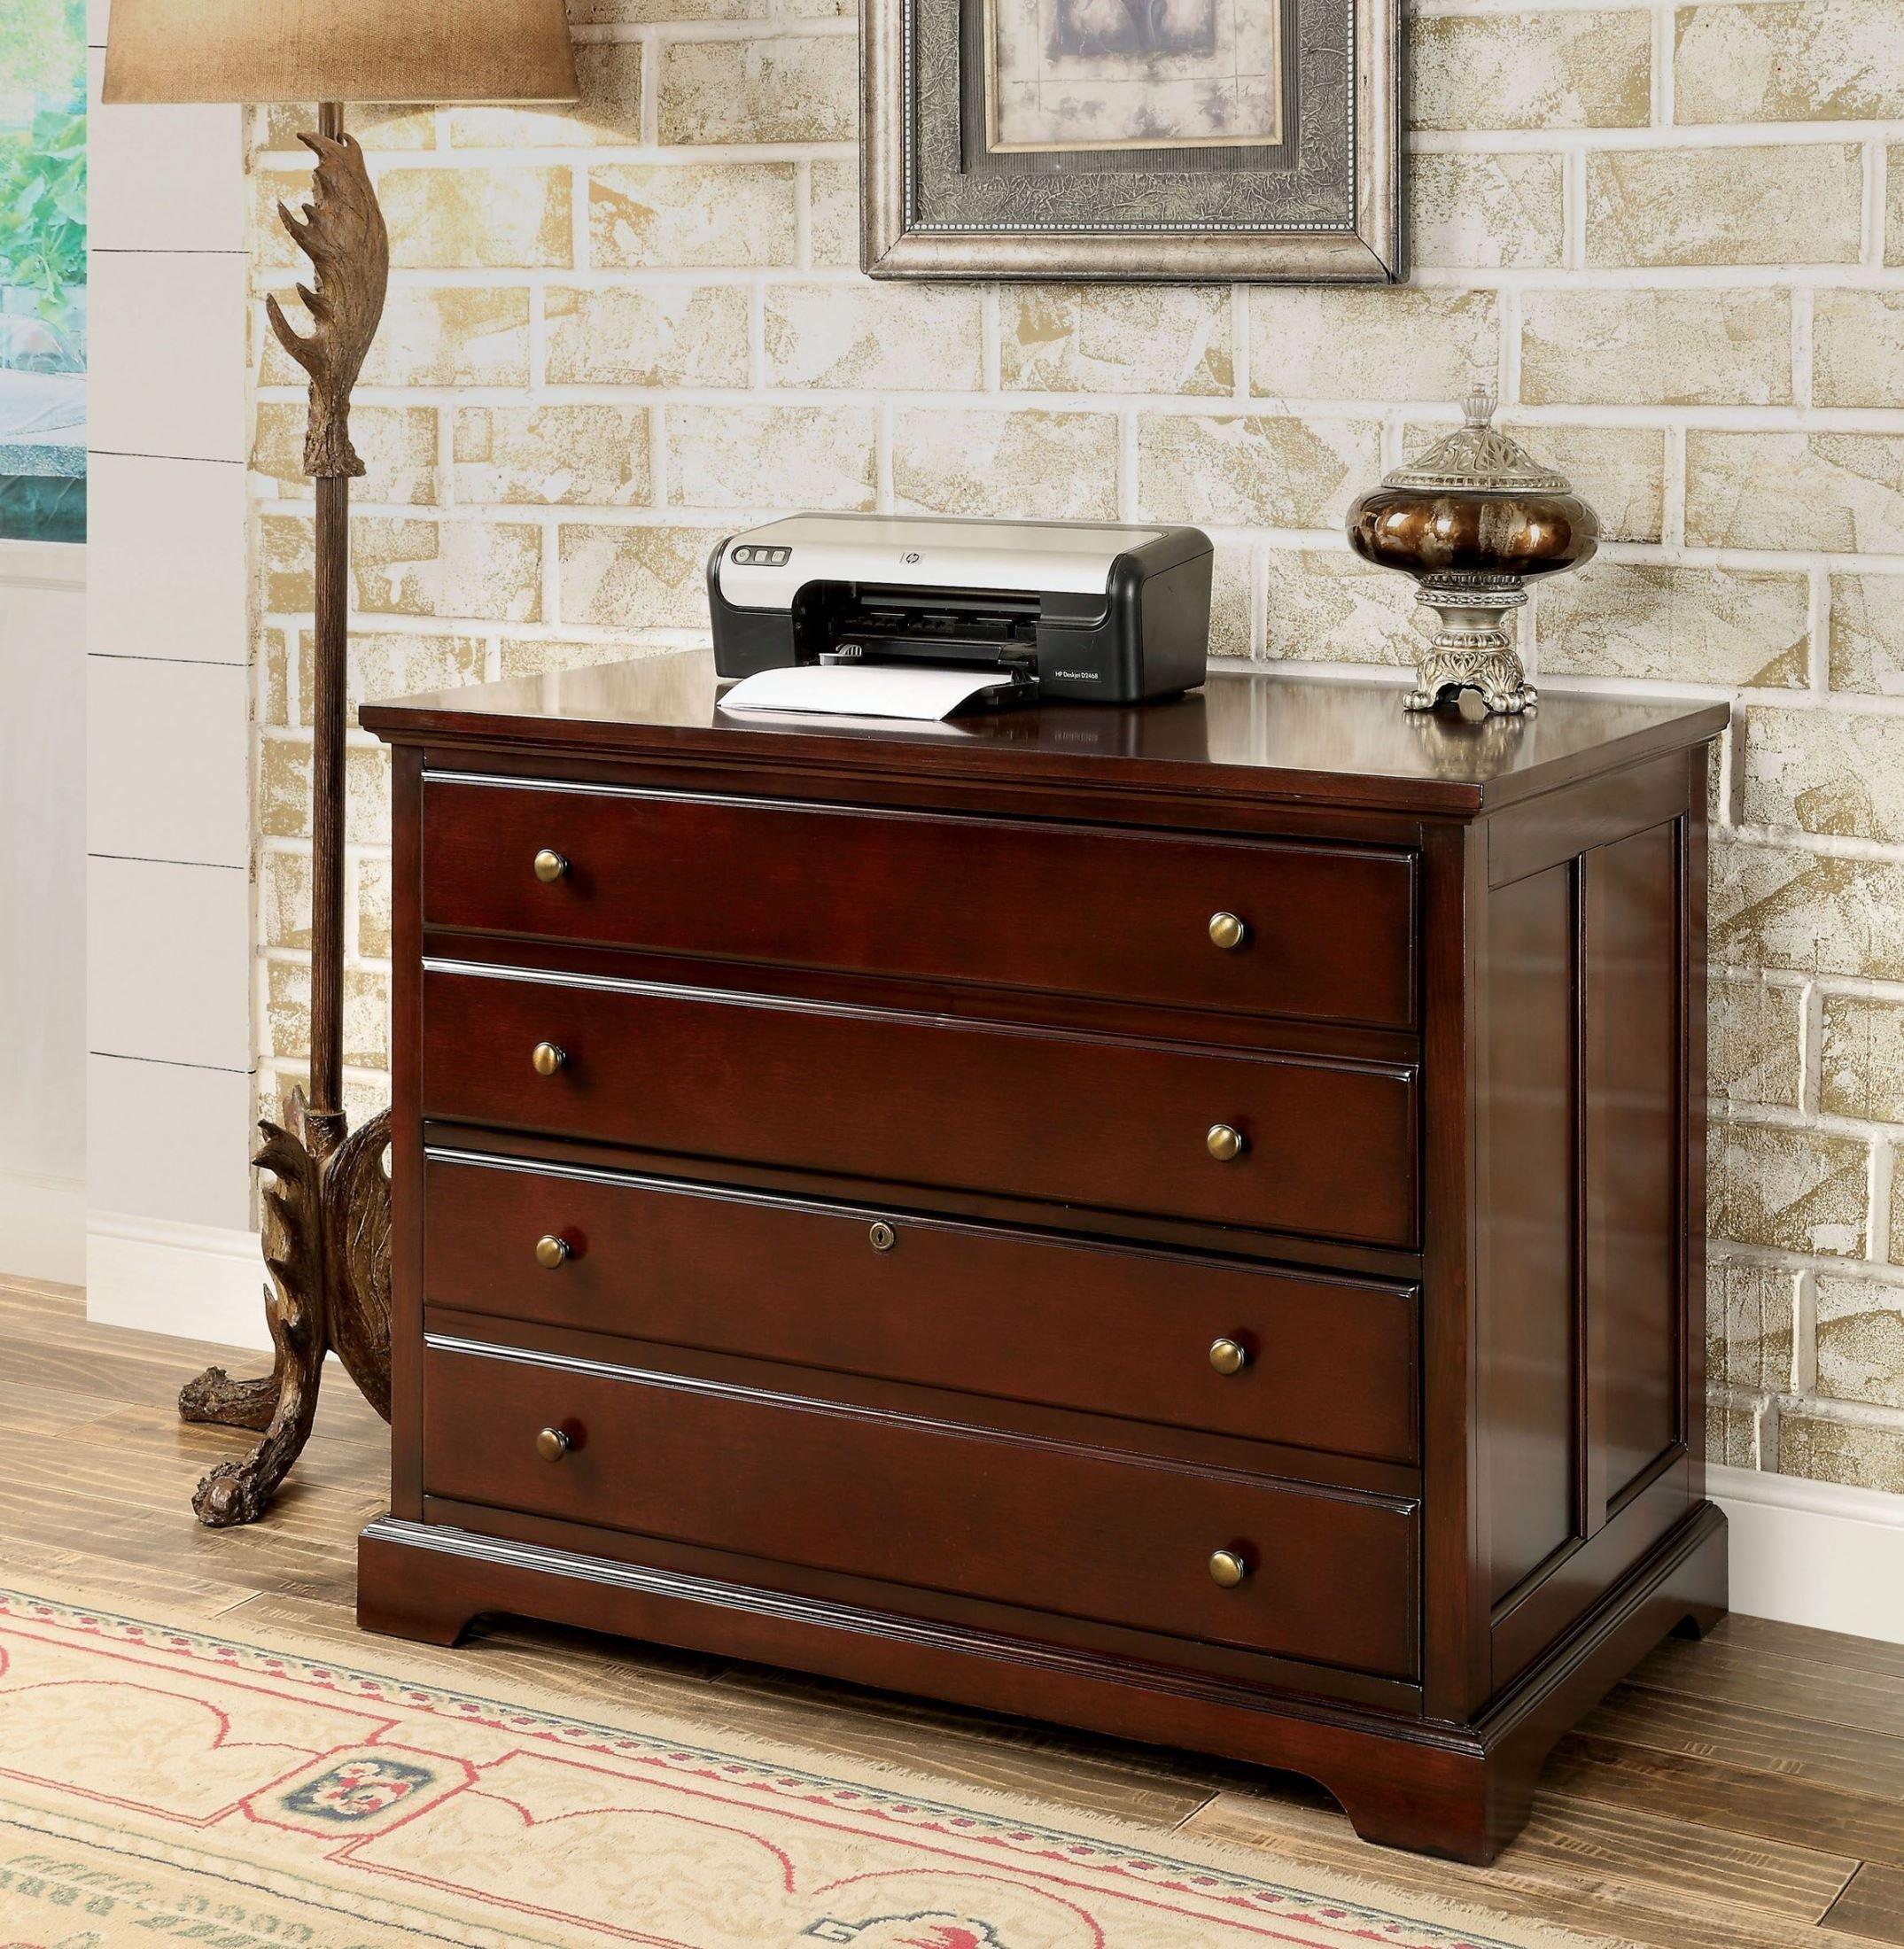 Furniture of America CM-DK6207C Desmont Cherry File Cabinet Miscellaneous-Home Office Desk